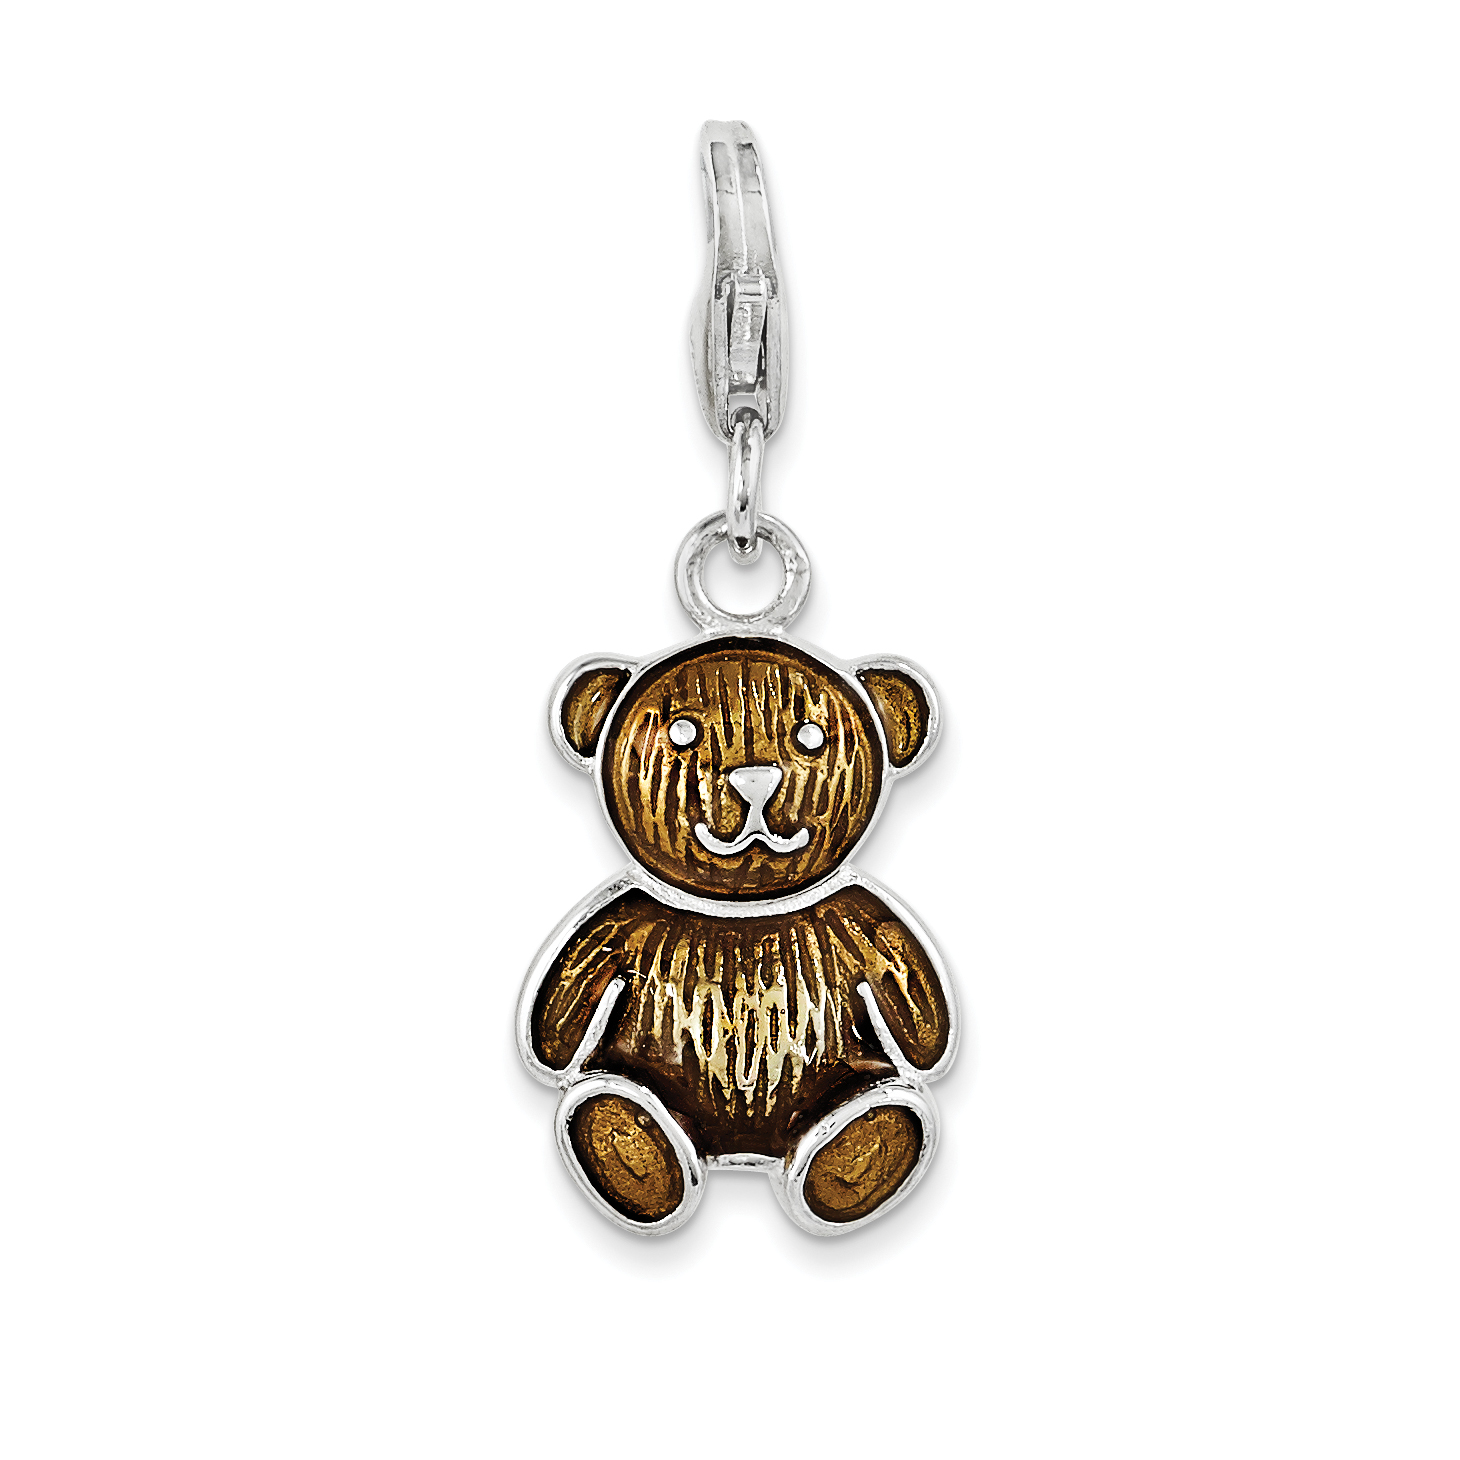 Amore La Vita 925 Sterling Silver Enameled Teddy Bear w// Lobster Clasp Charm